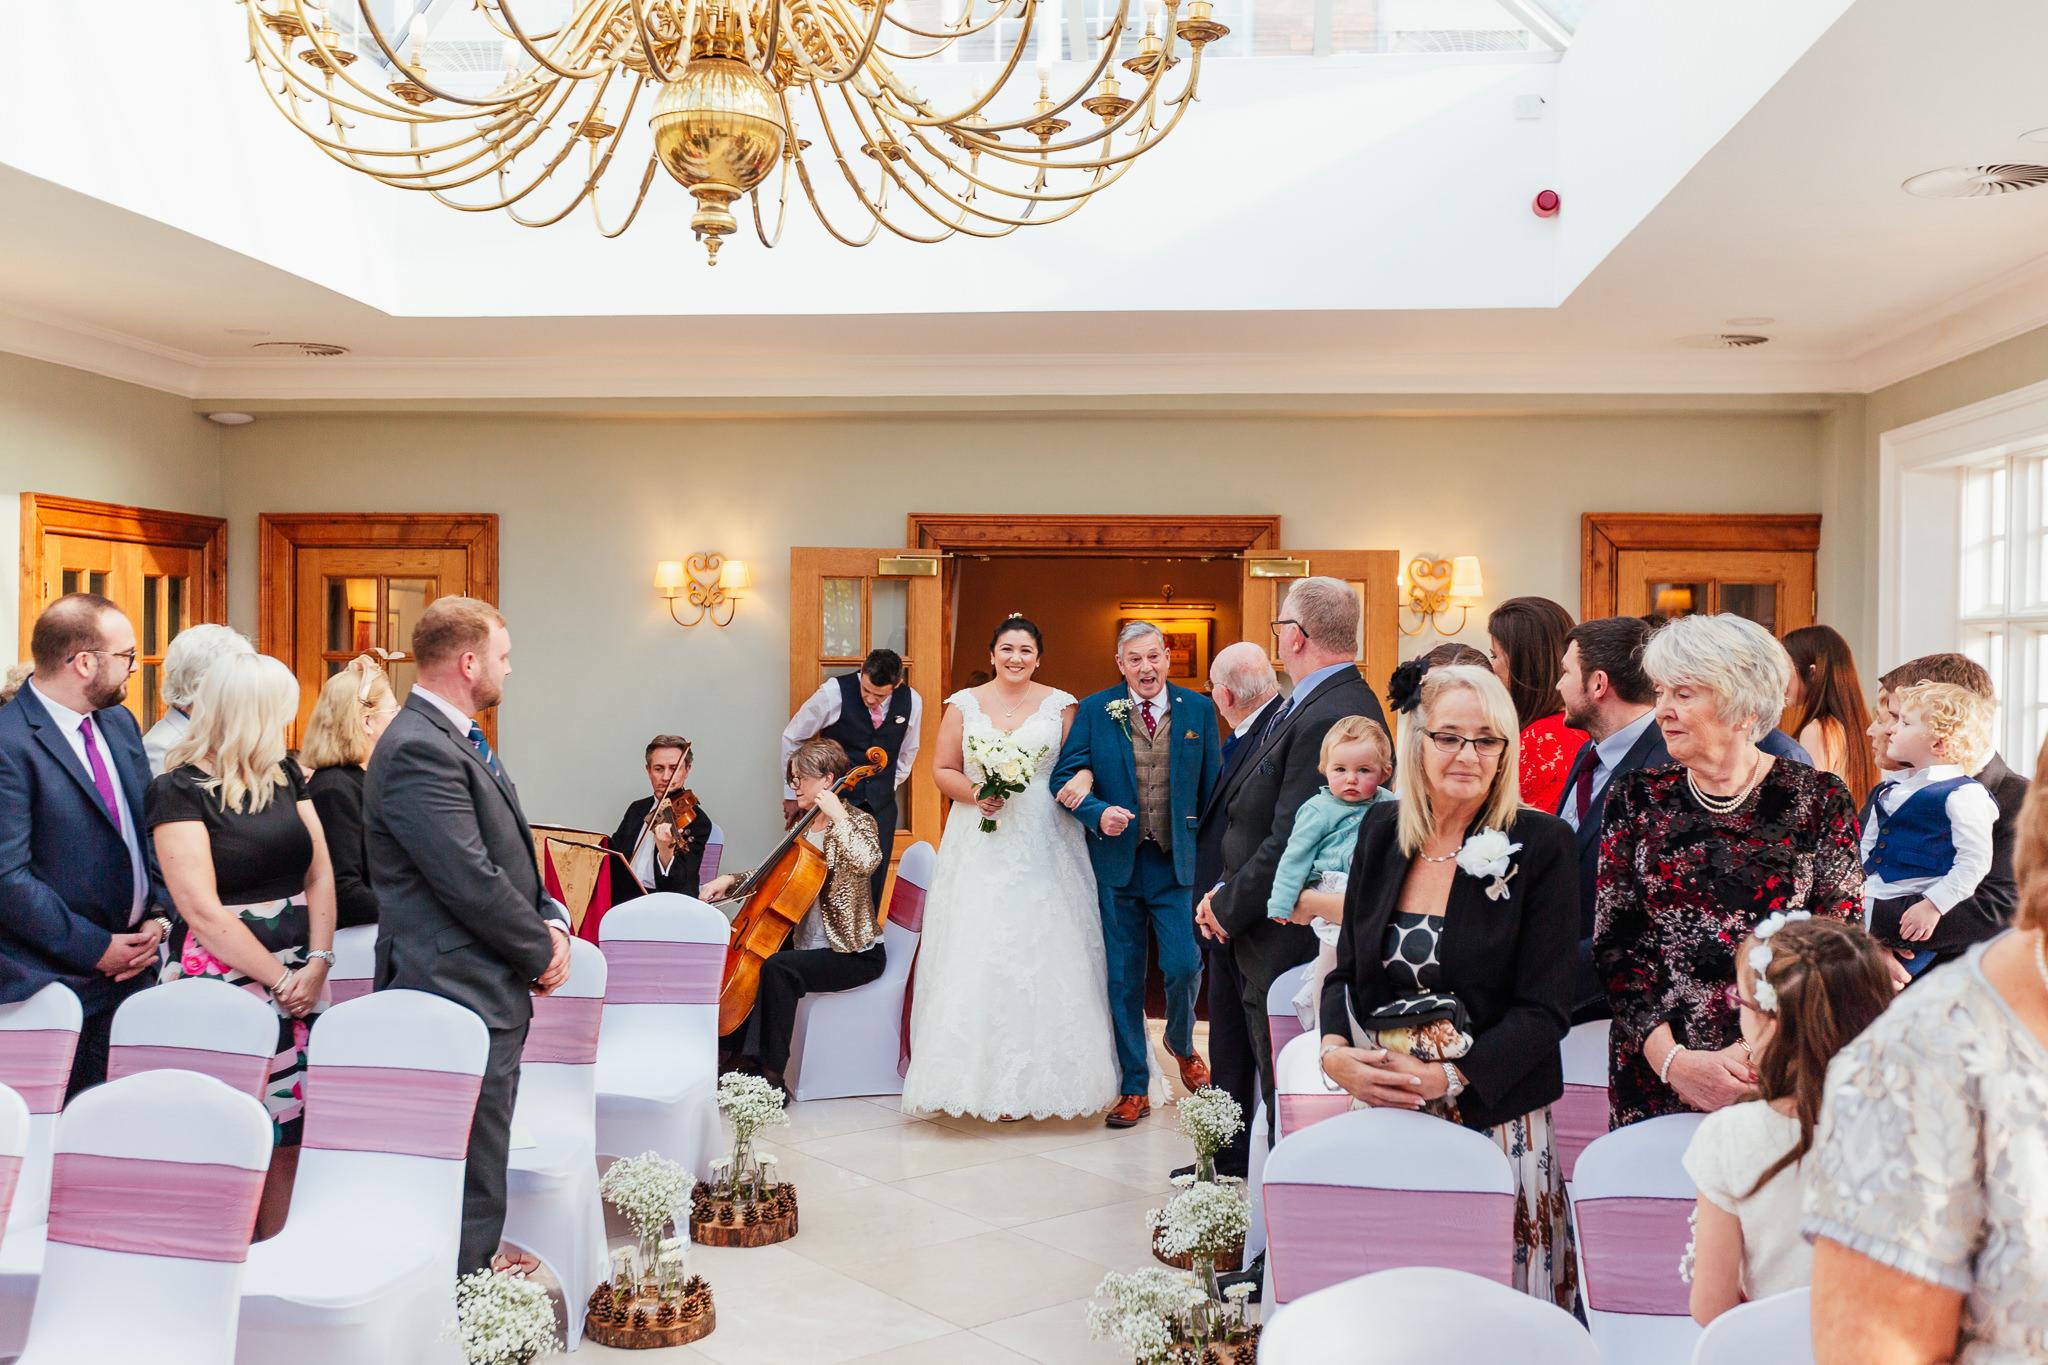 Willington-Hall-Cheshire-Wedding-11.jpg